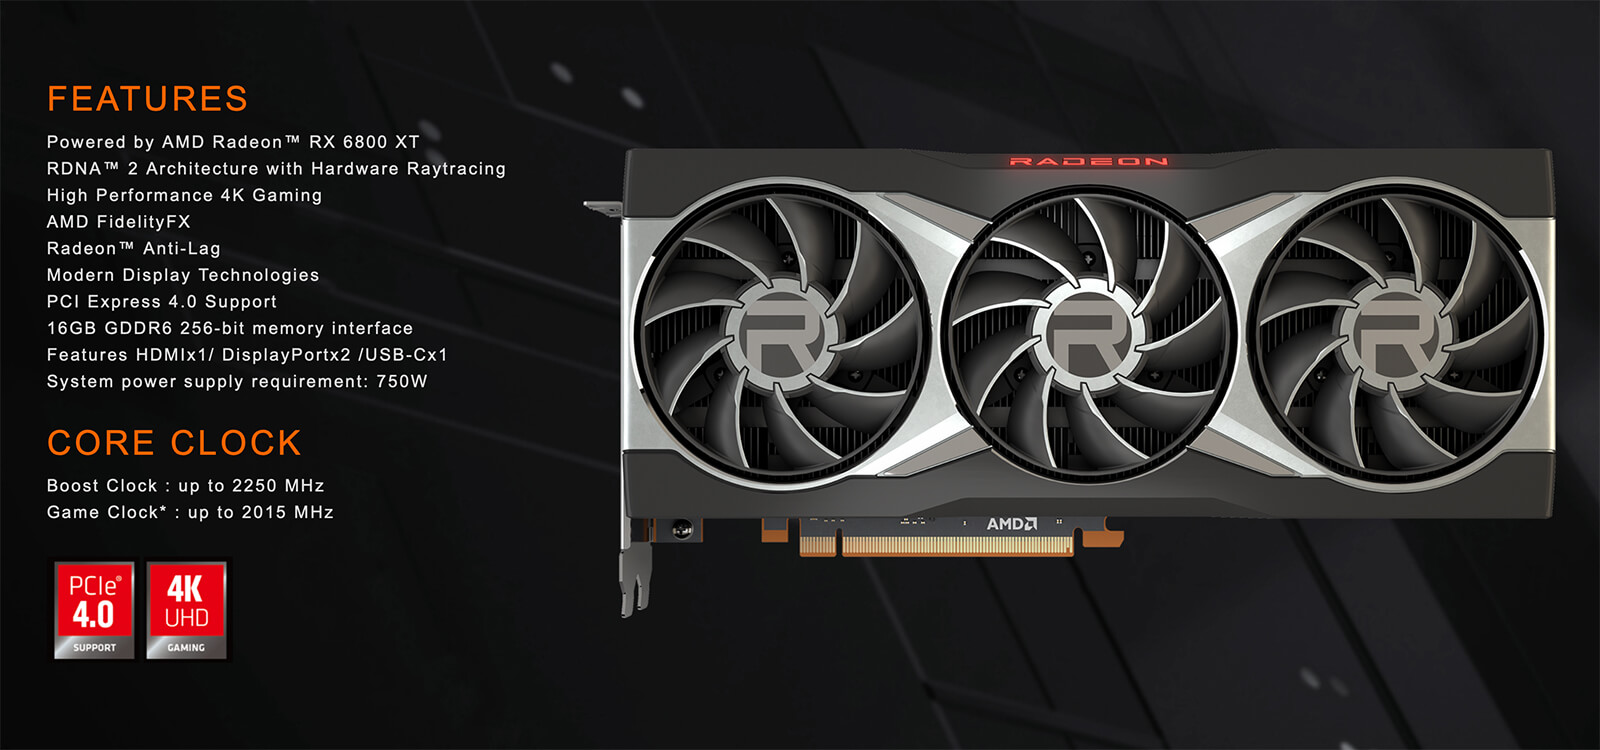 Gigabyte Radeon™ Rx 6800 Xt 16g 16gb Gddr6 Features